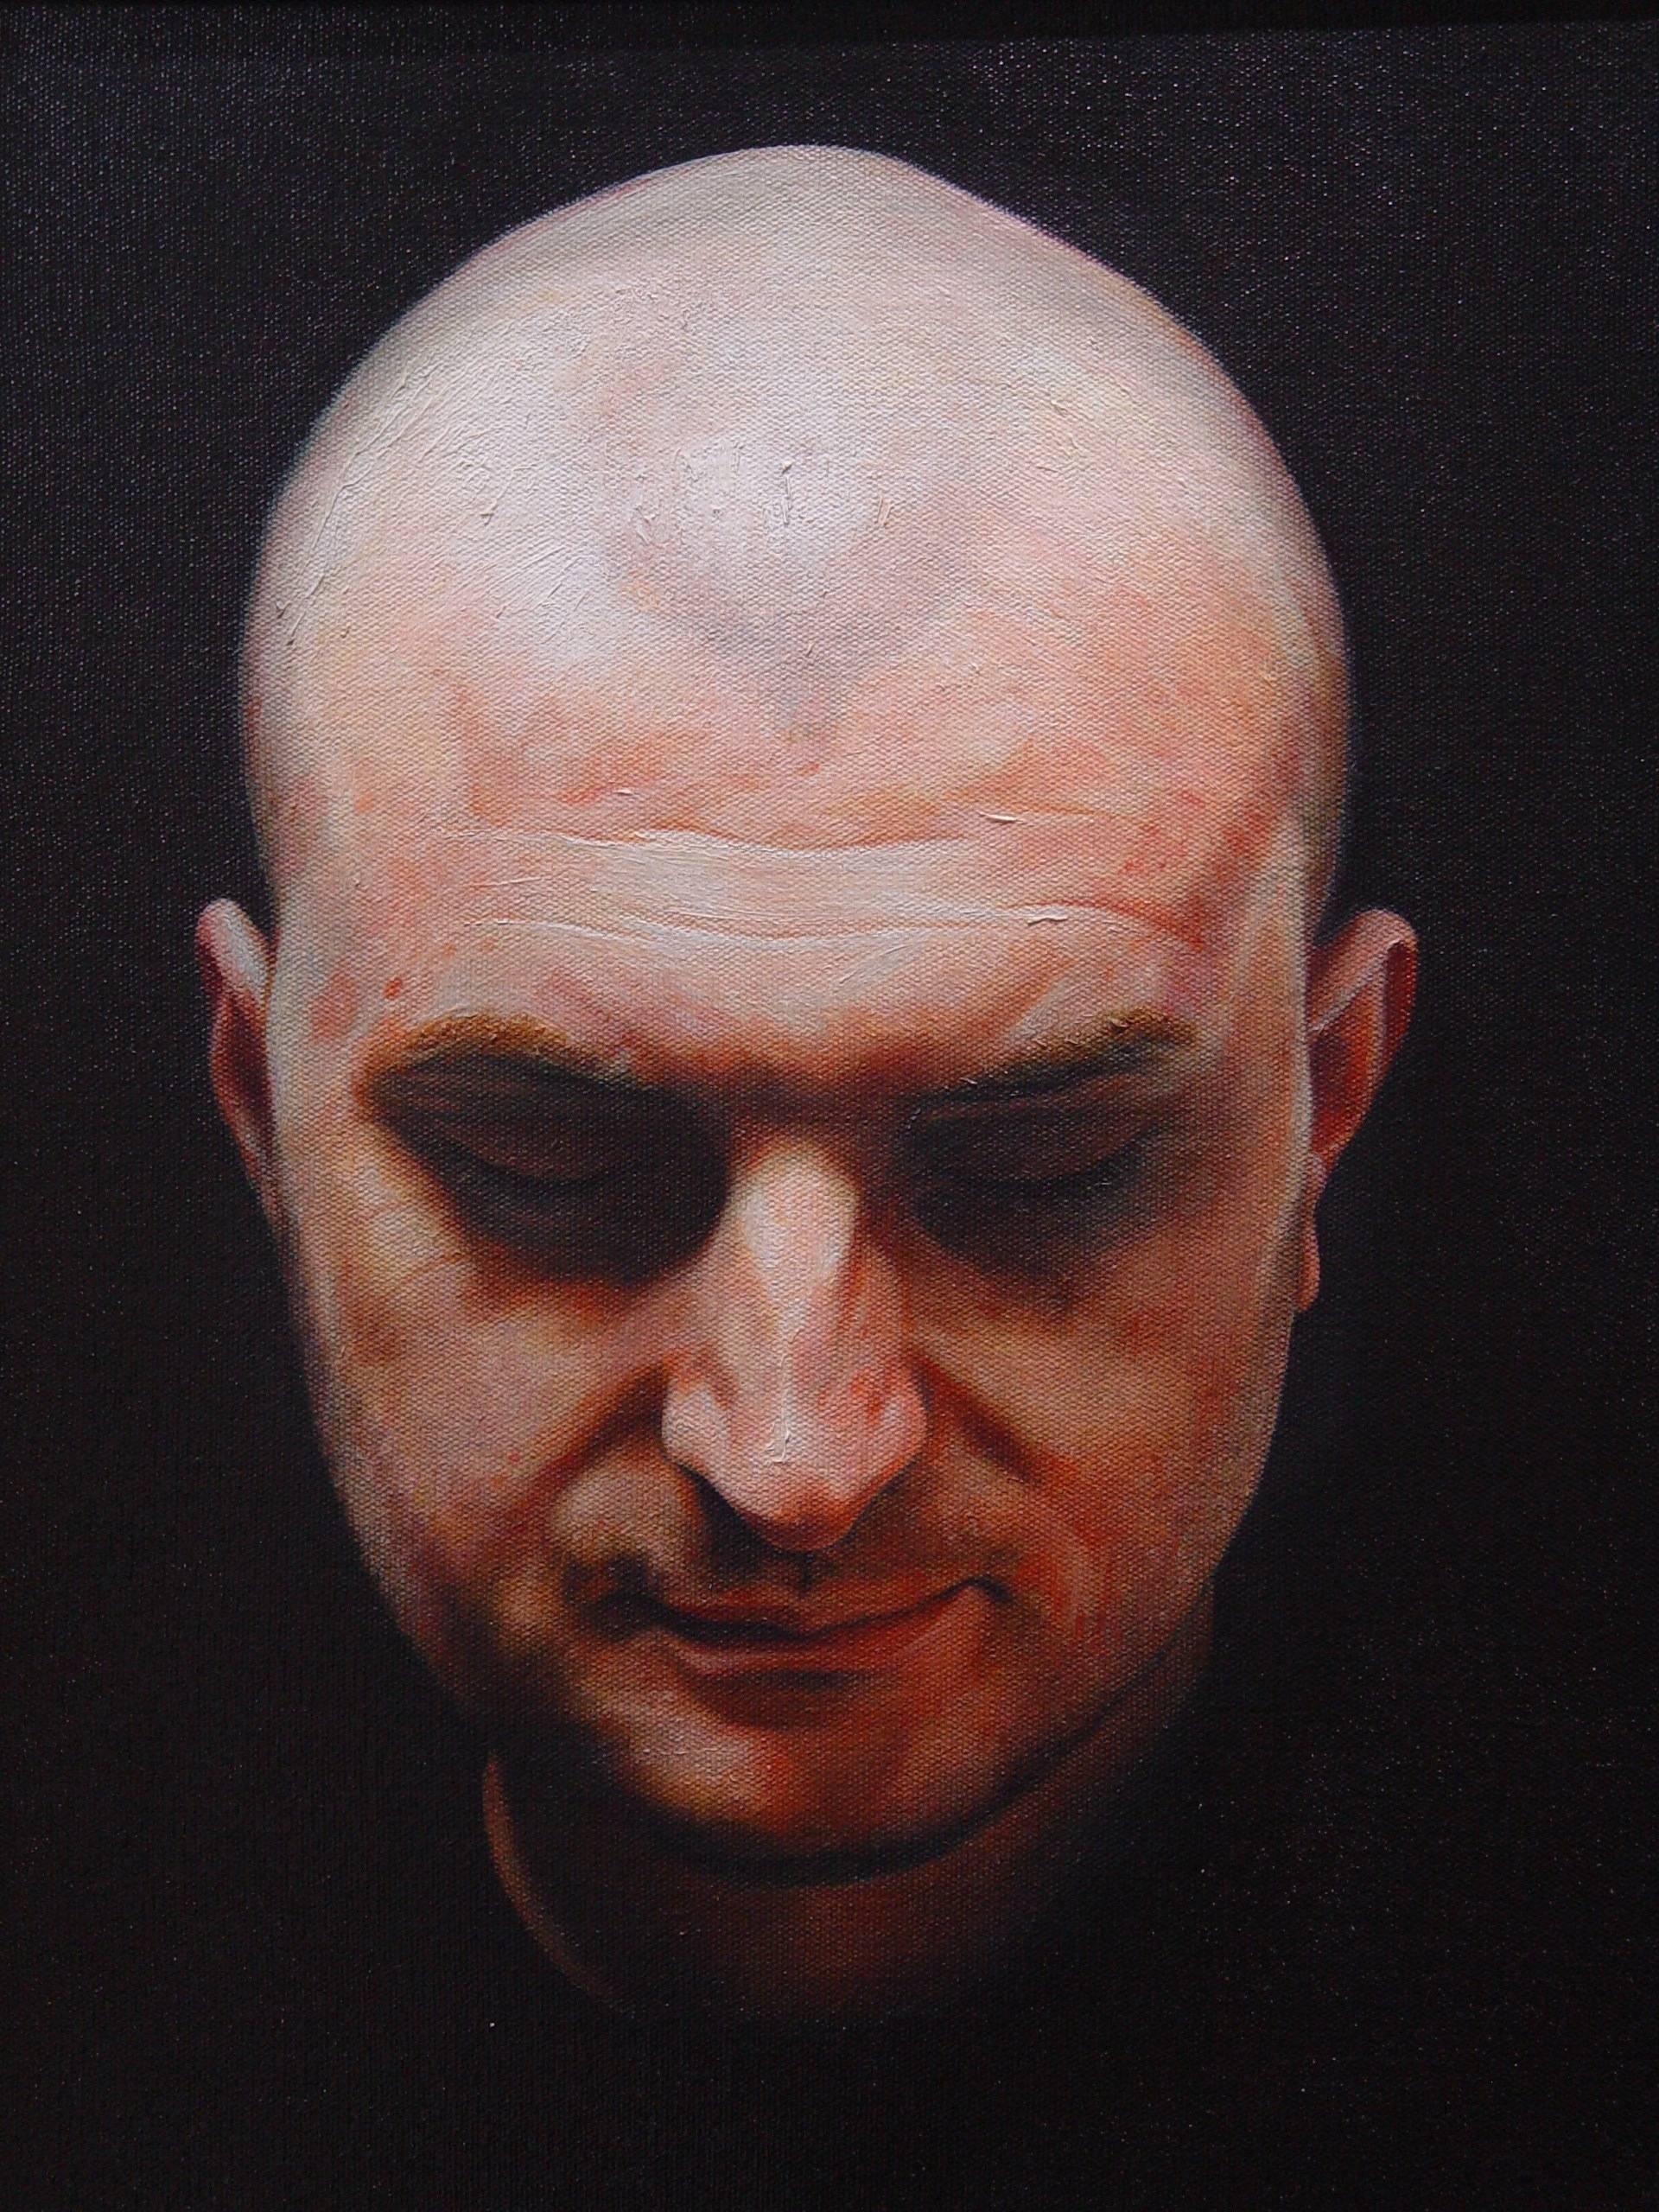 Head 2 - Contemporary, Photo-realism